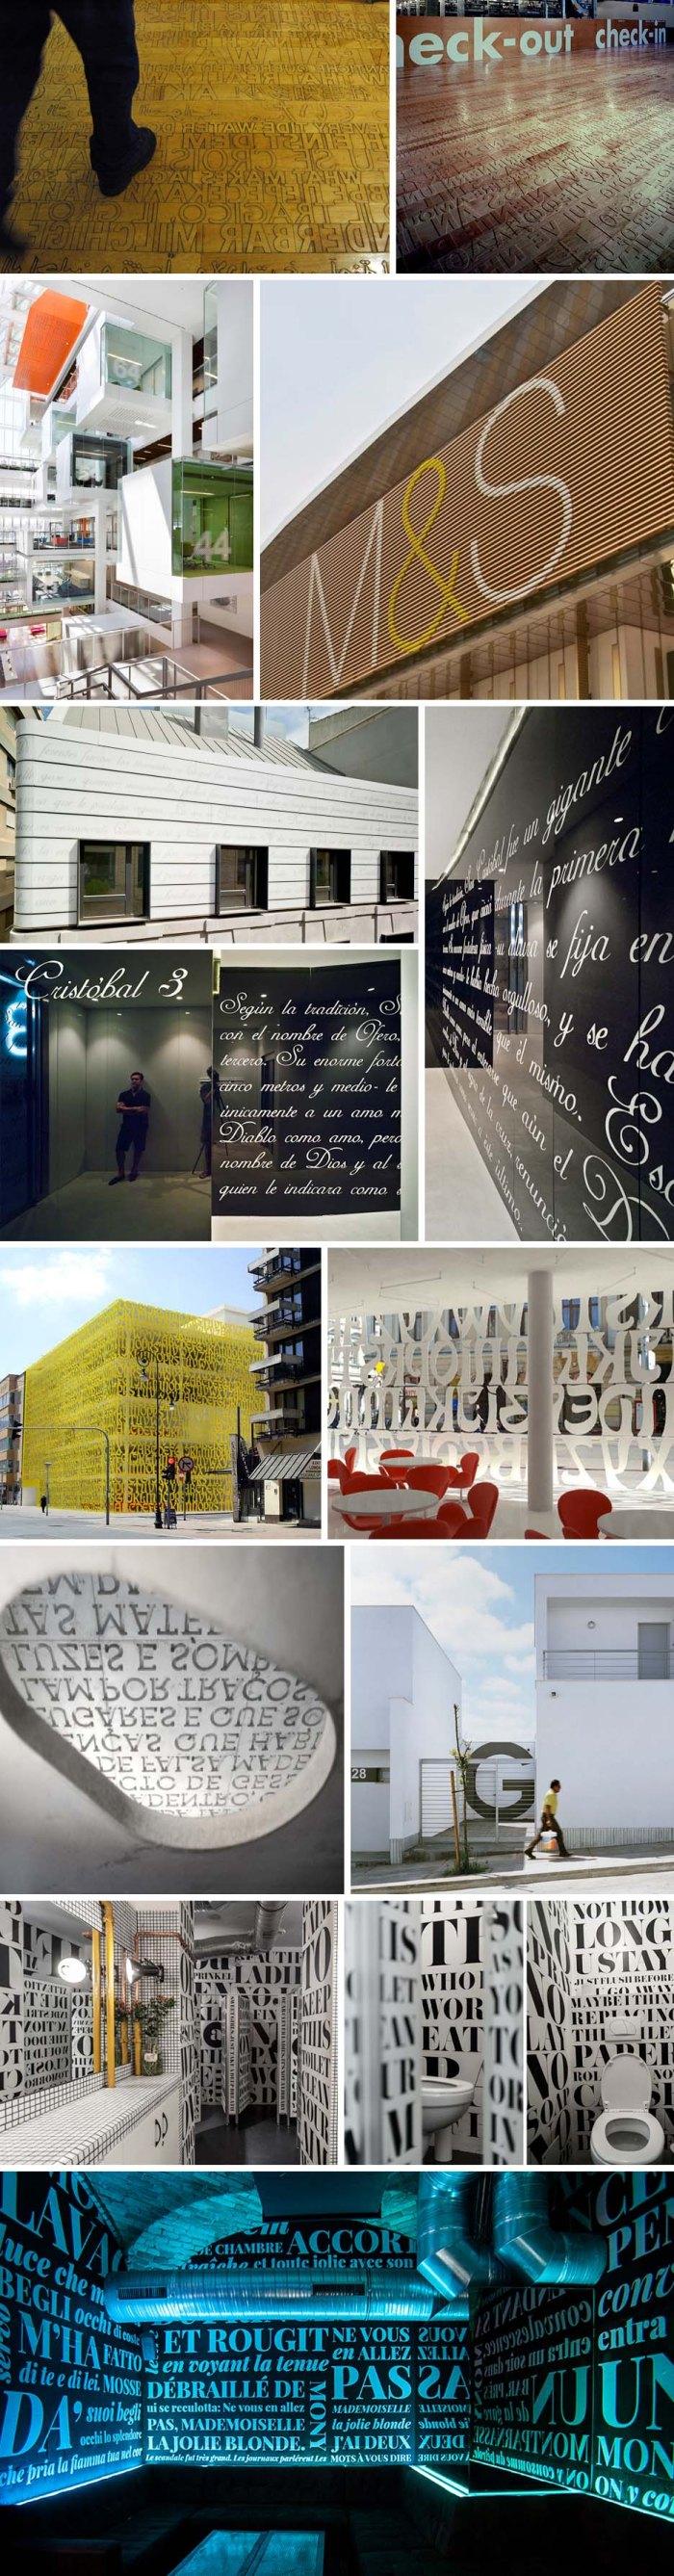 Typography in Architecture, Library by manfredinicoletti Architects, Architypeture, Letters on Architecture, environmental design, signage, Pentagram, Ann Hamilton, Clavel Arquitectos, manfredinicoletti, grelewicz, trafiq, 81Font